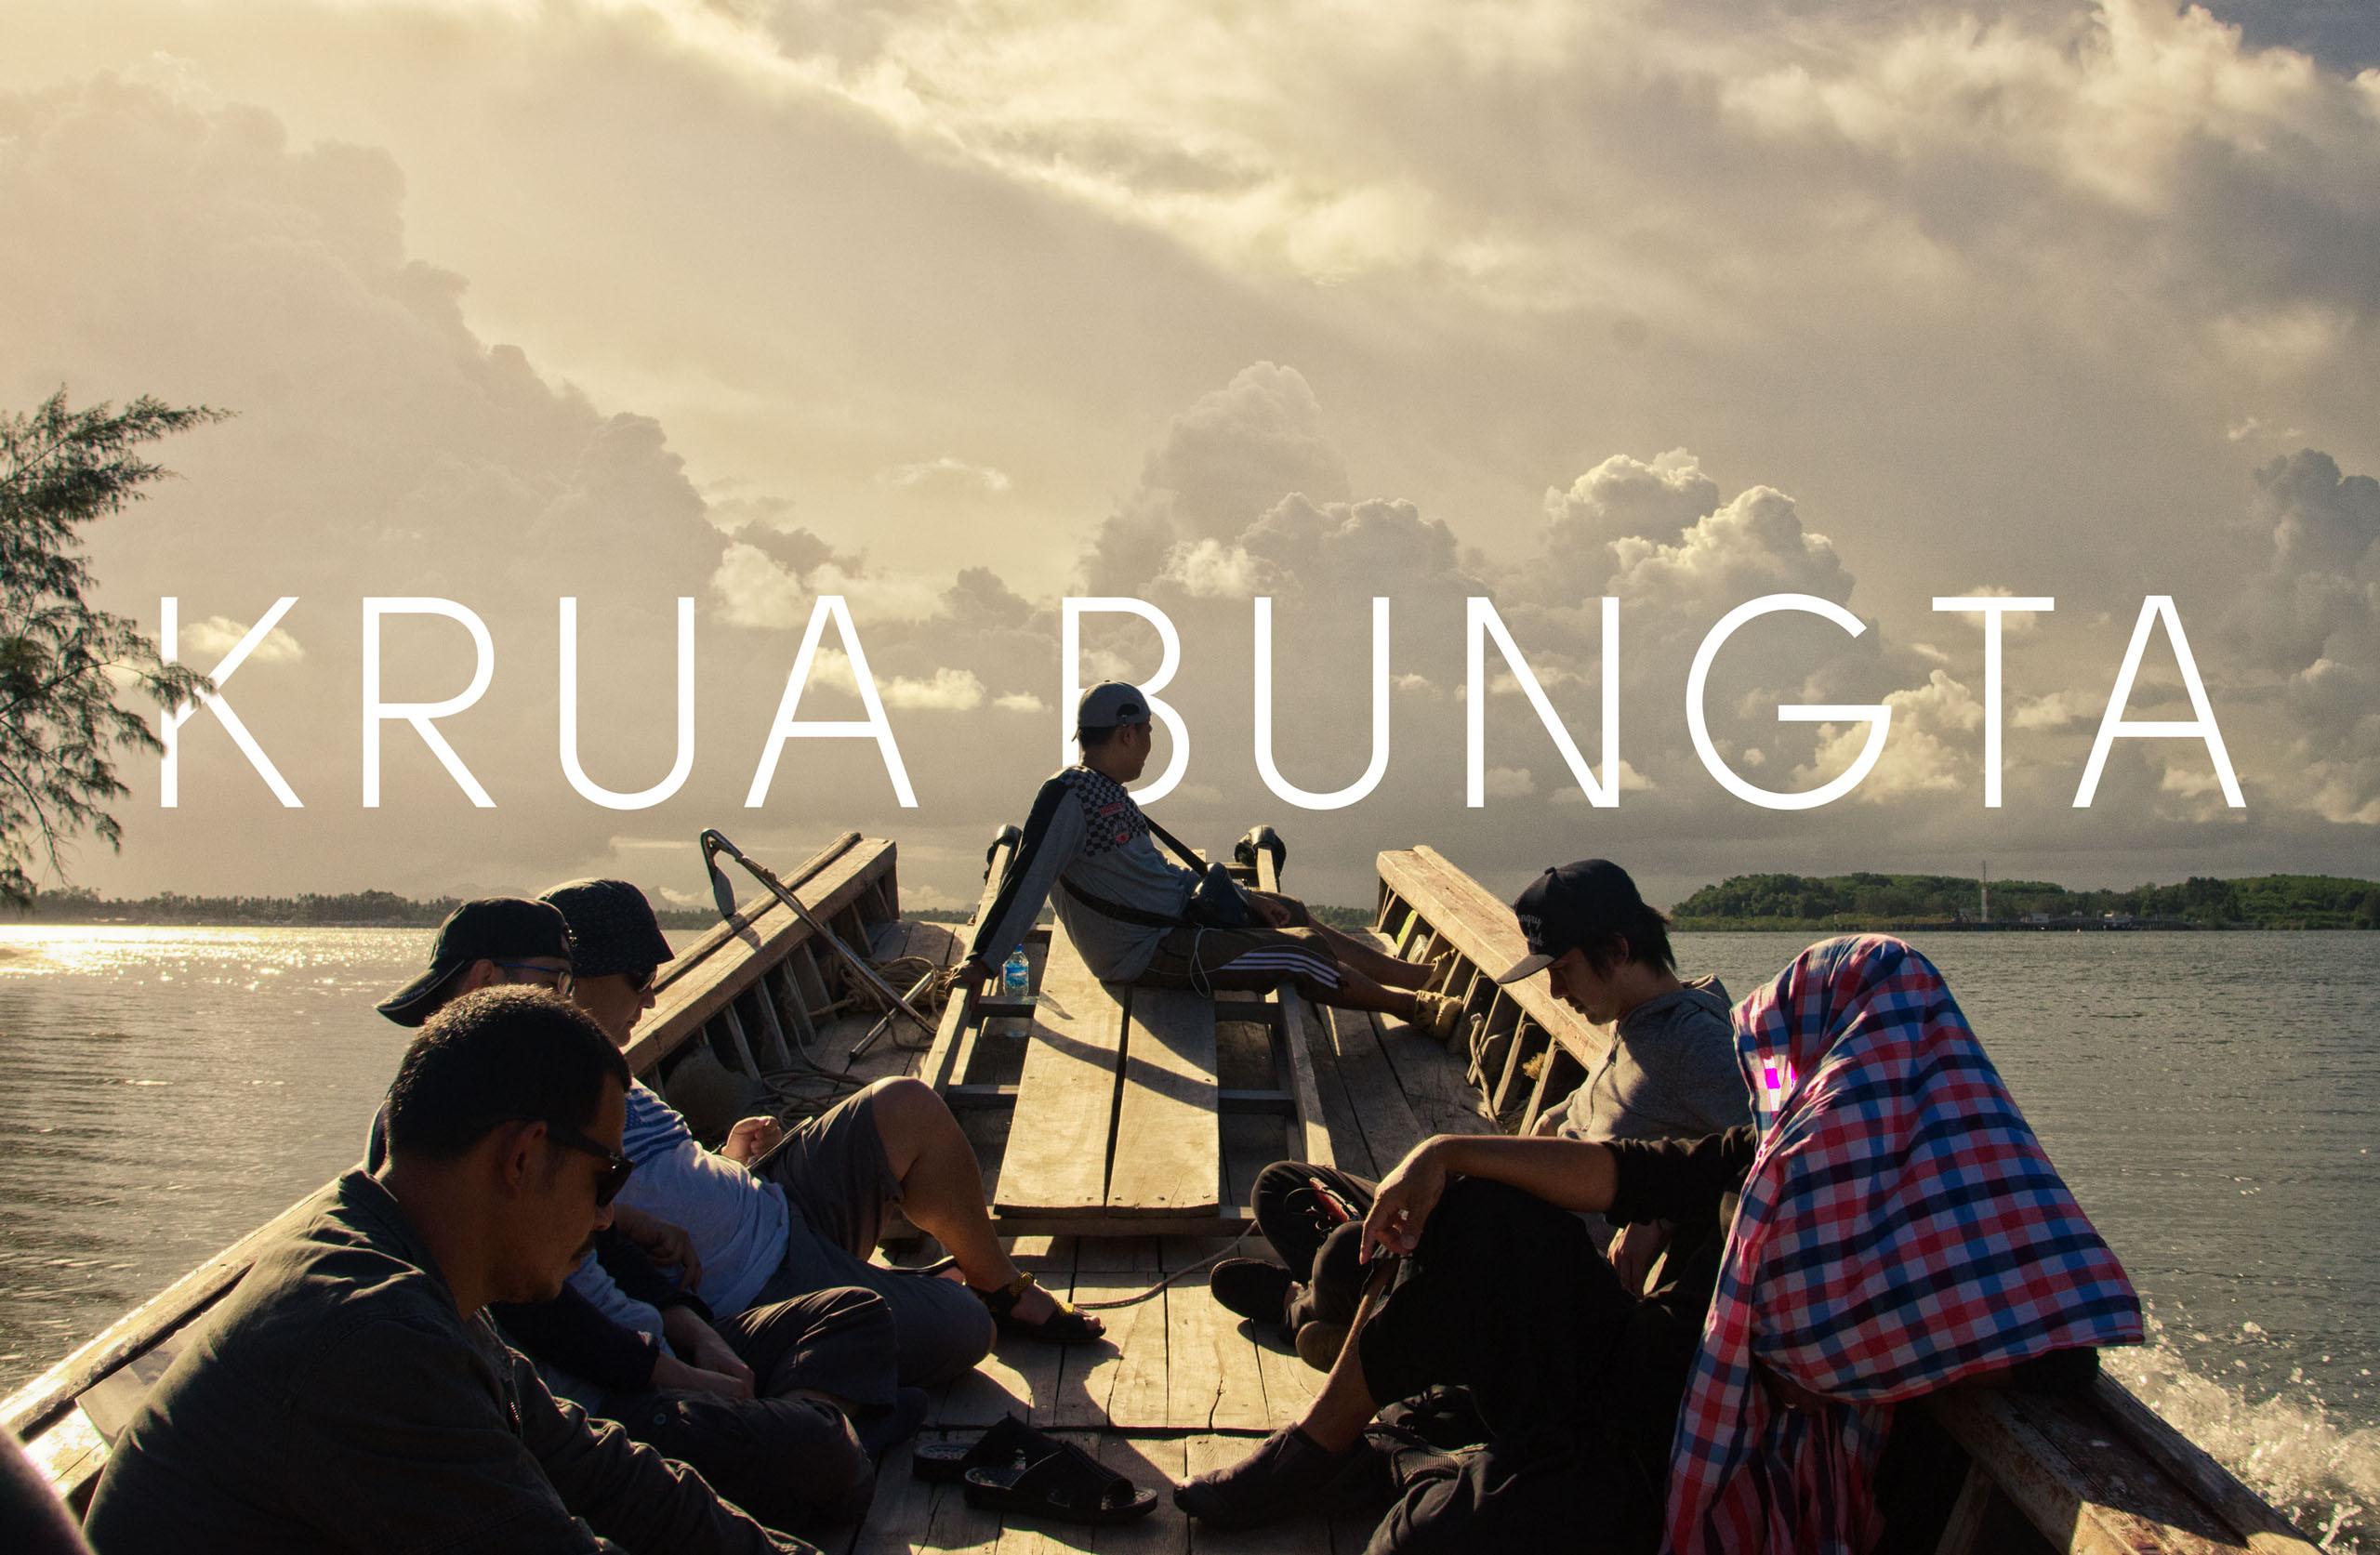 Krua-Bungta